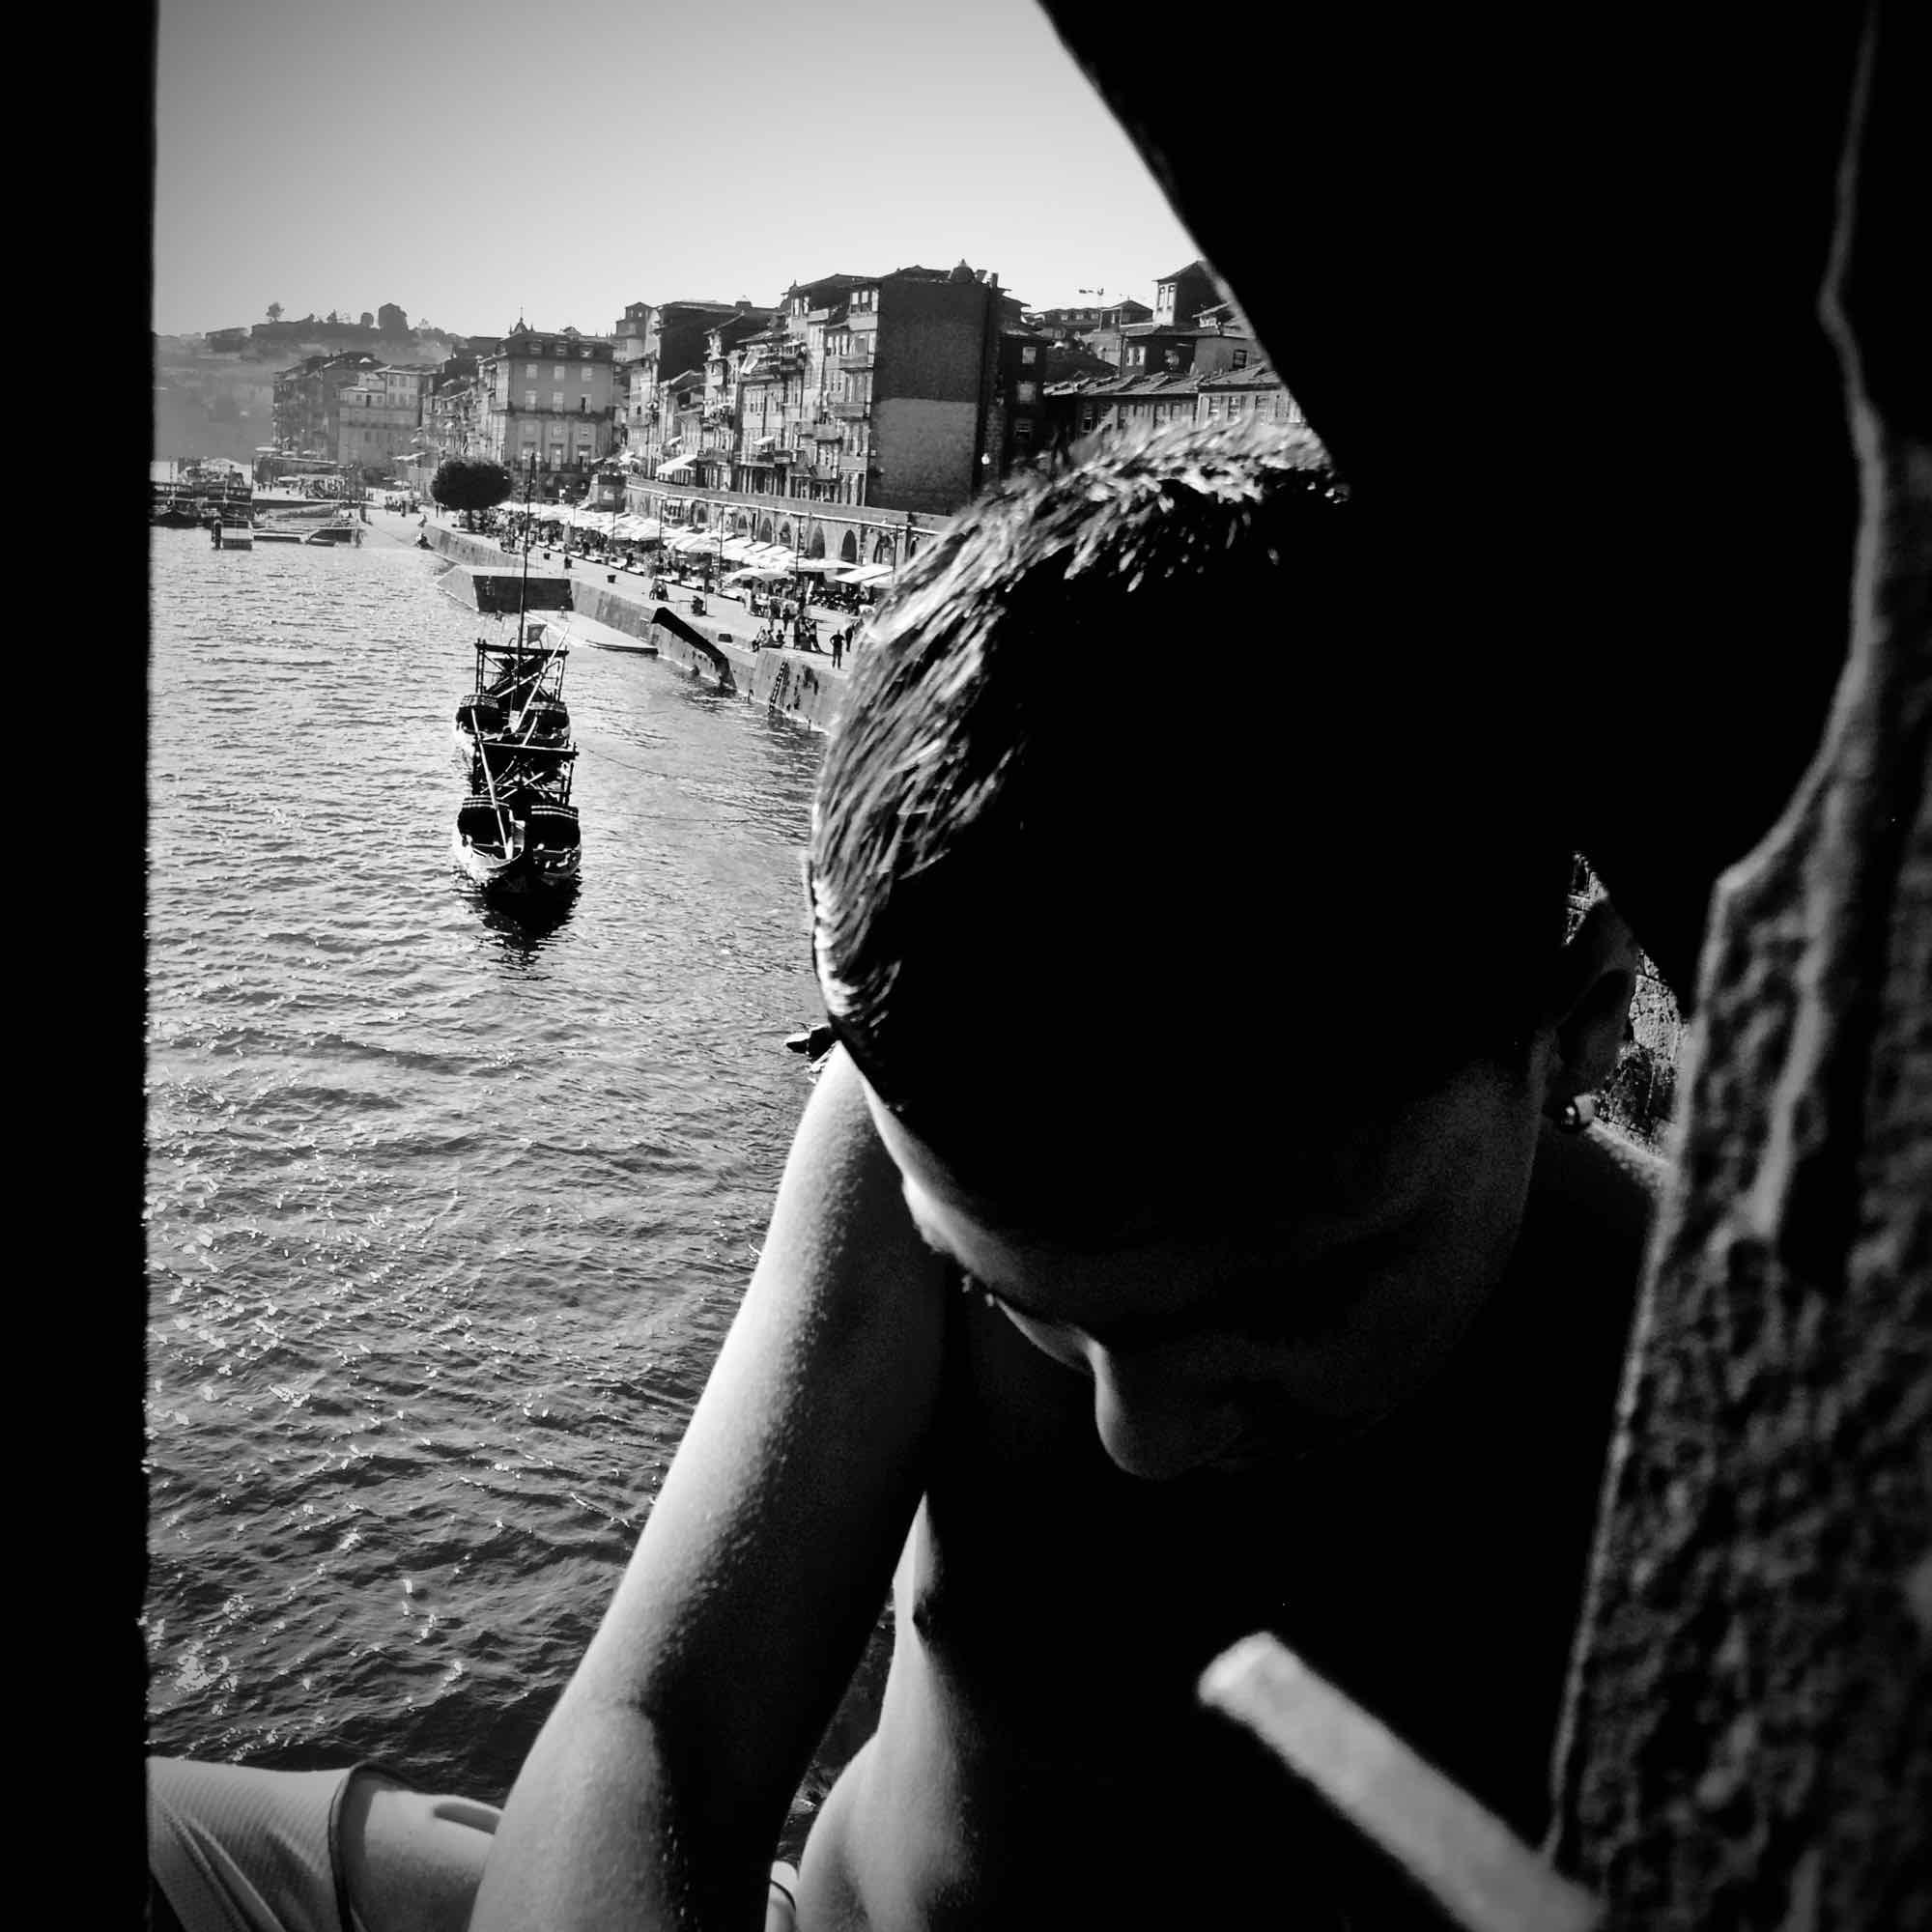 Ponte Dom Luis I 2012 Massimiliano Scarpa Photographer - 28 di 31